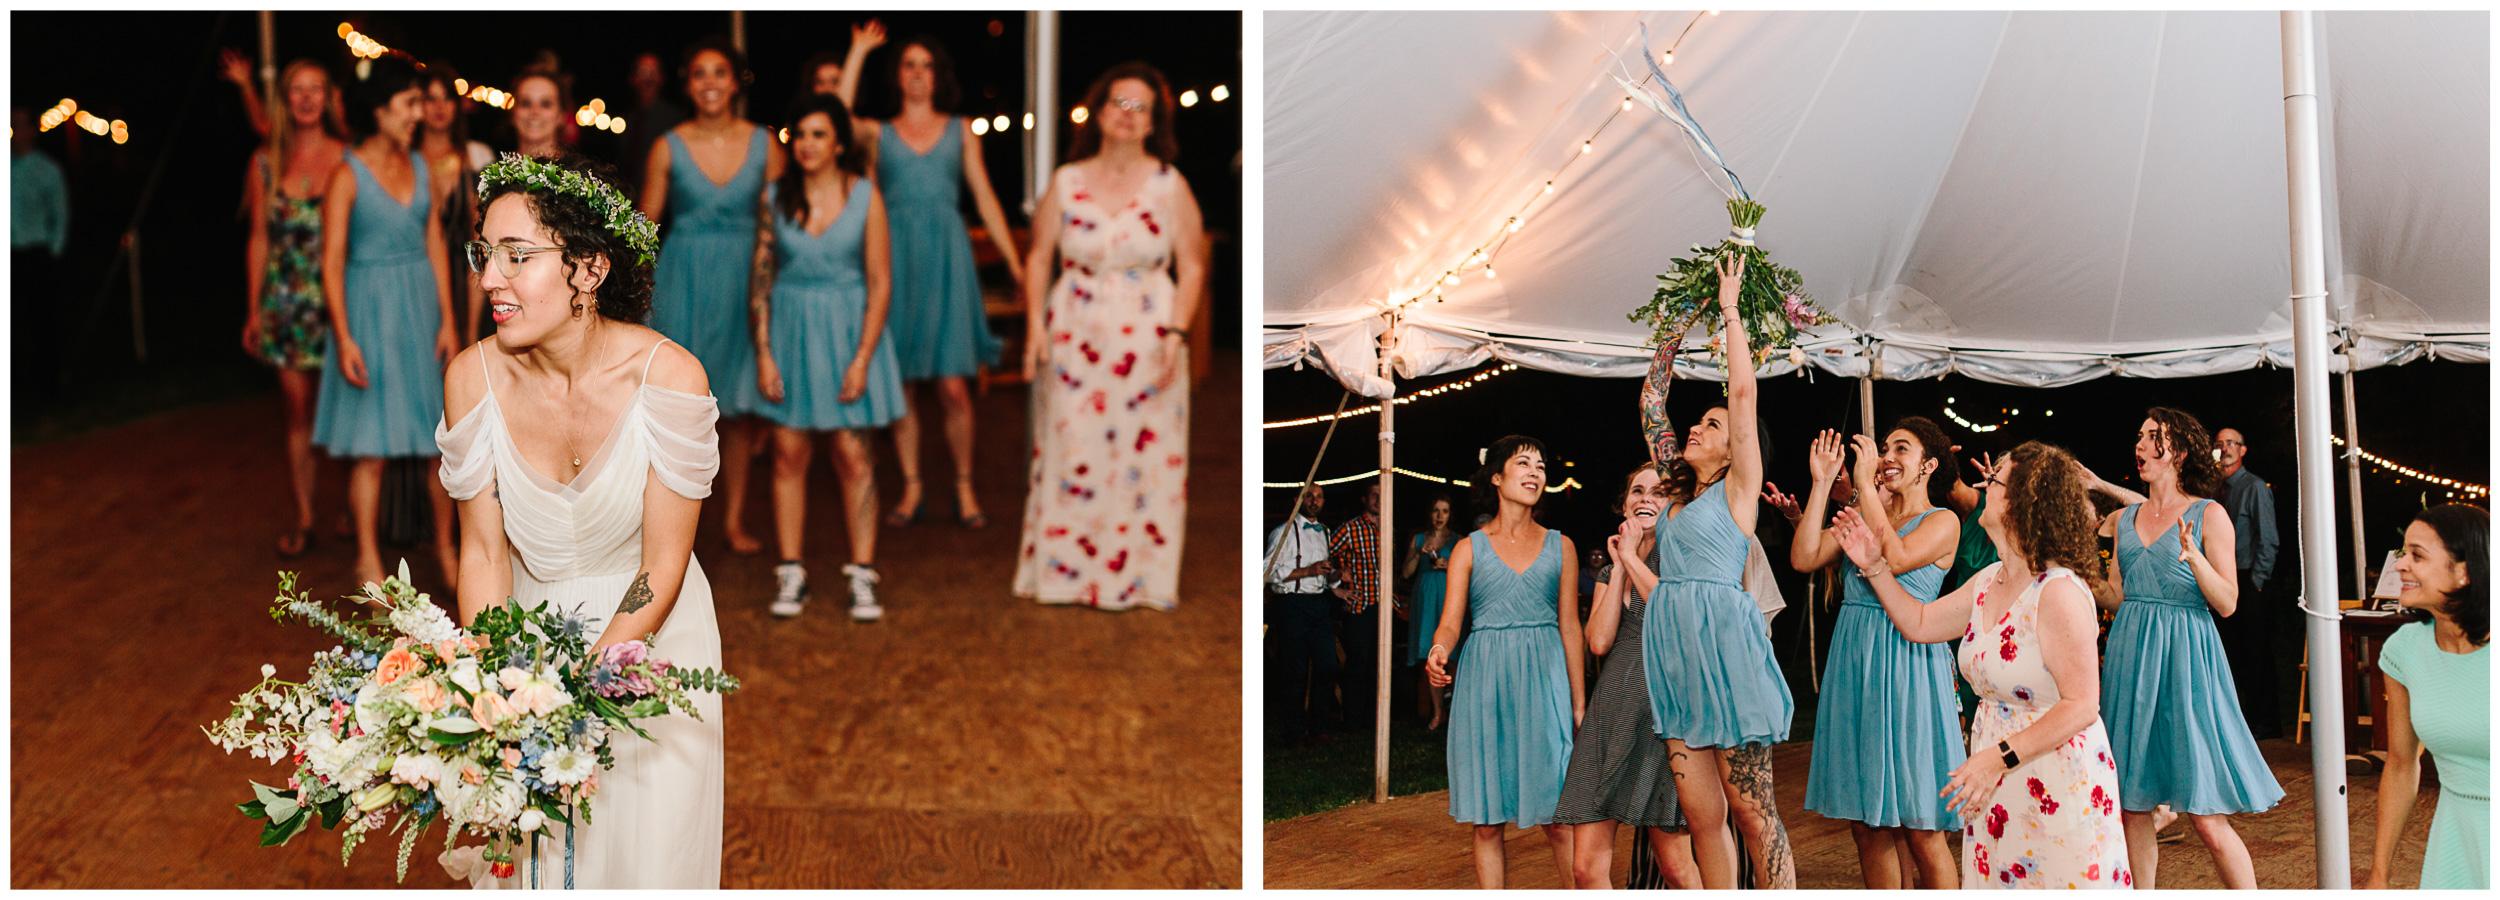 lyons_colorado_wedding_81.jpg